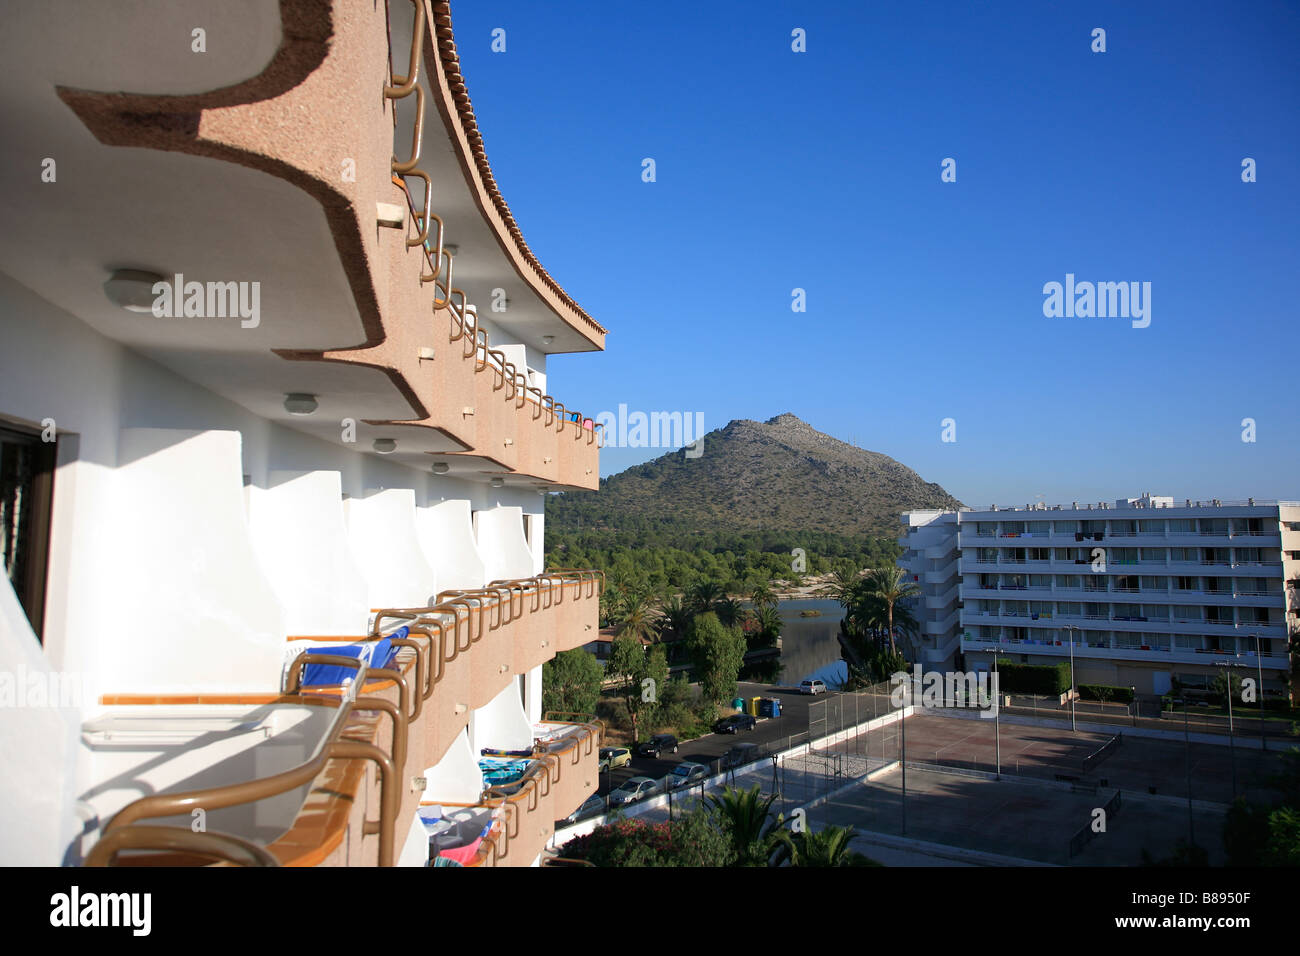 Balcony 4star Hotel Maritimo Puerto de Alcudia Town Mallorca Majorca Island Balearic Isles Mediterranean Sea Spain - Stock Image